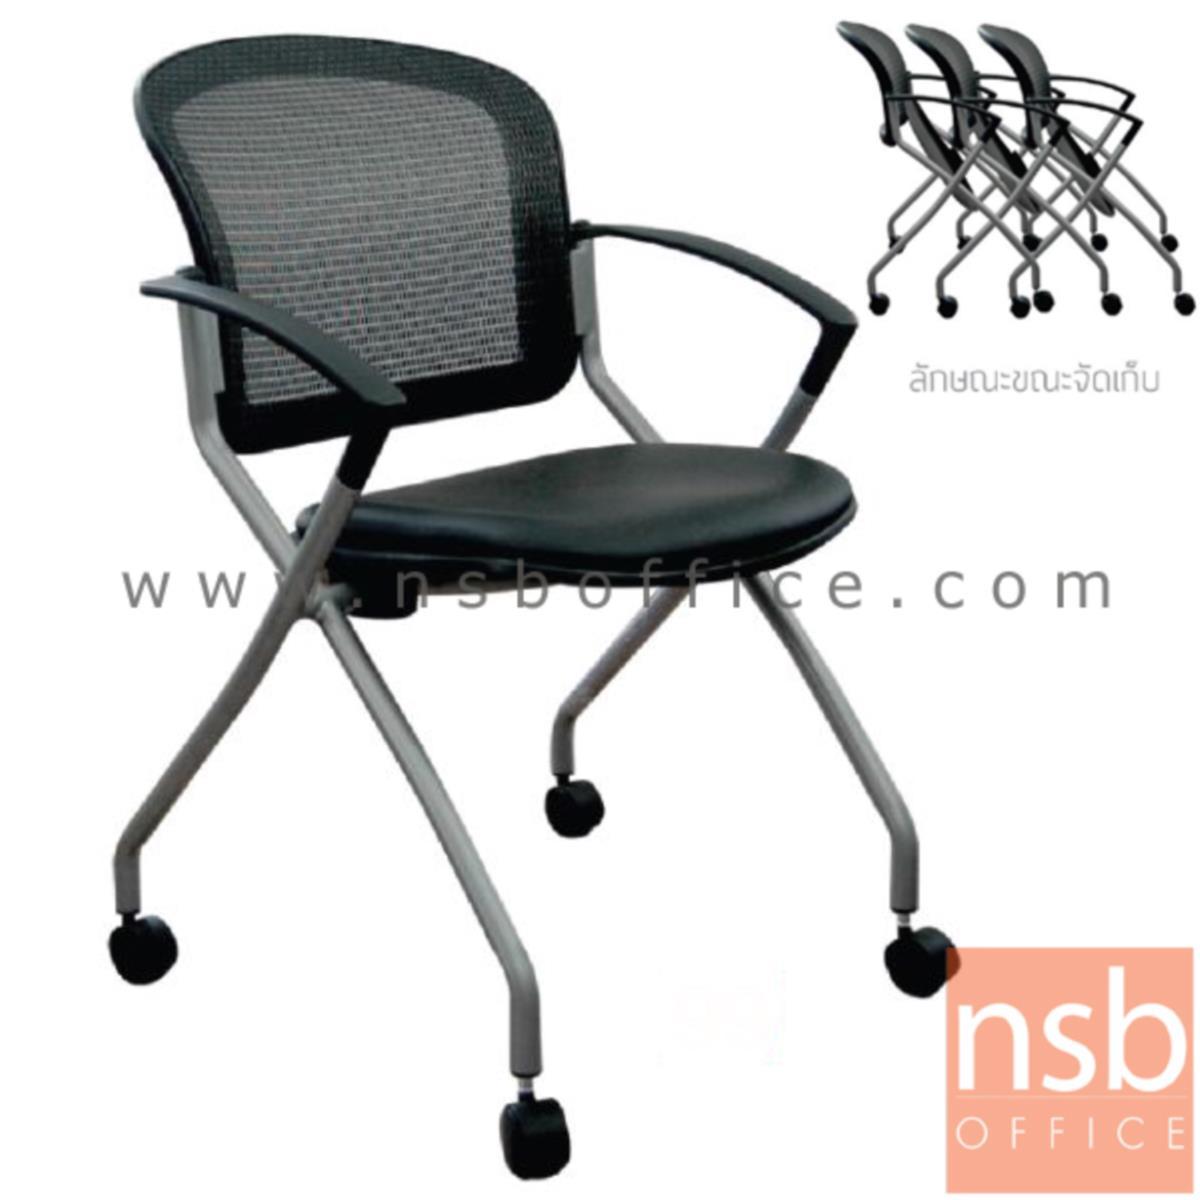 B24A096:เก้าอี้สำนักงานหลังเน็ต รุ่น Glacio  ขาเหล็กพ่นสีเทา